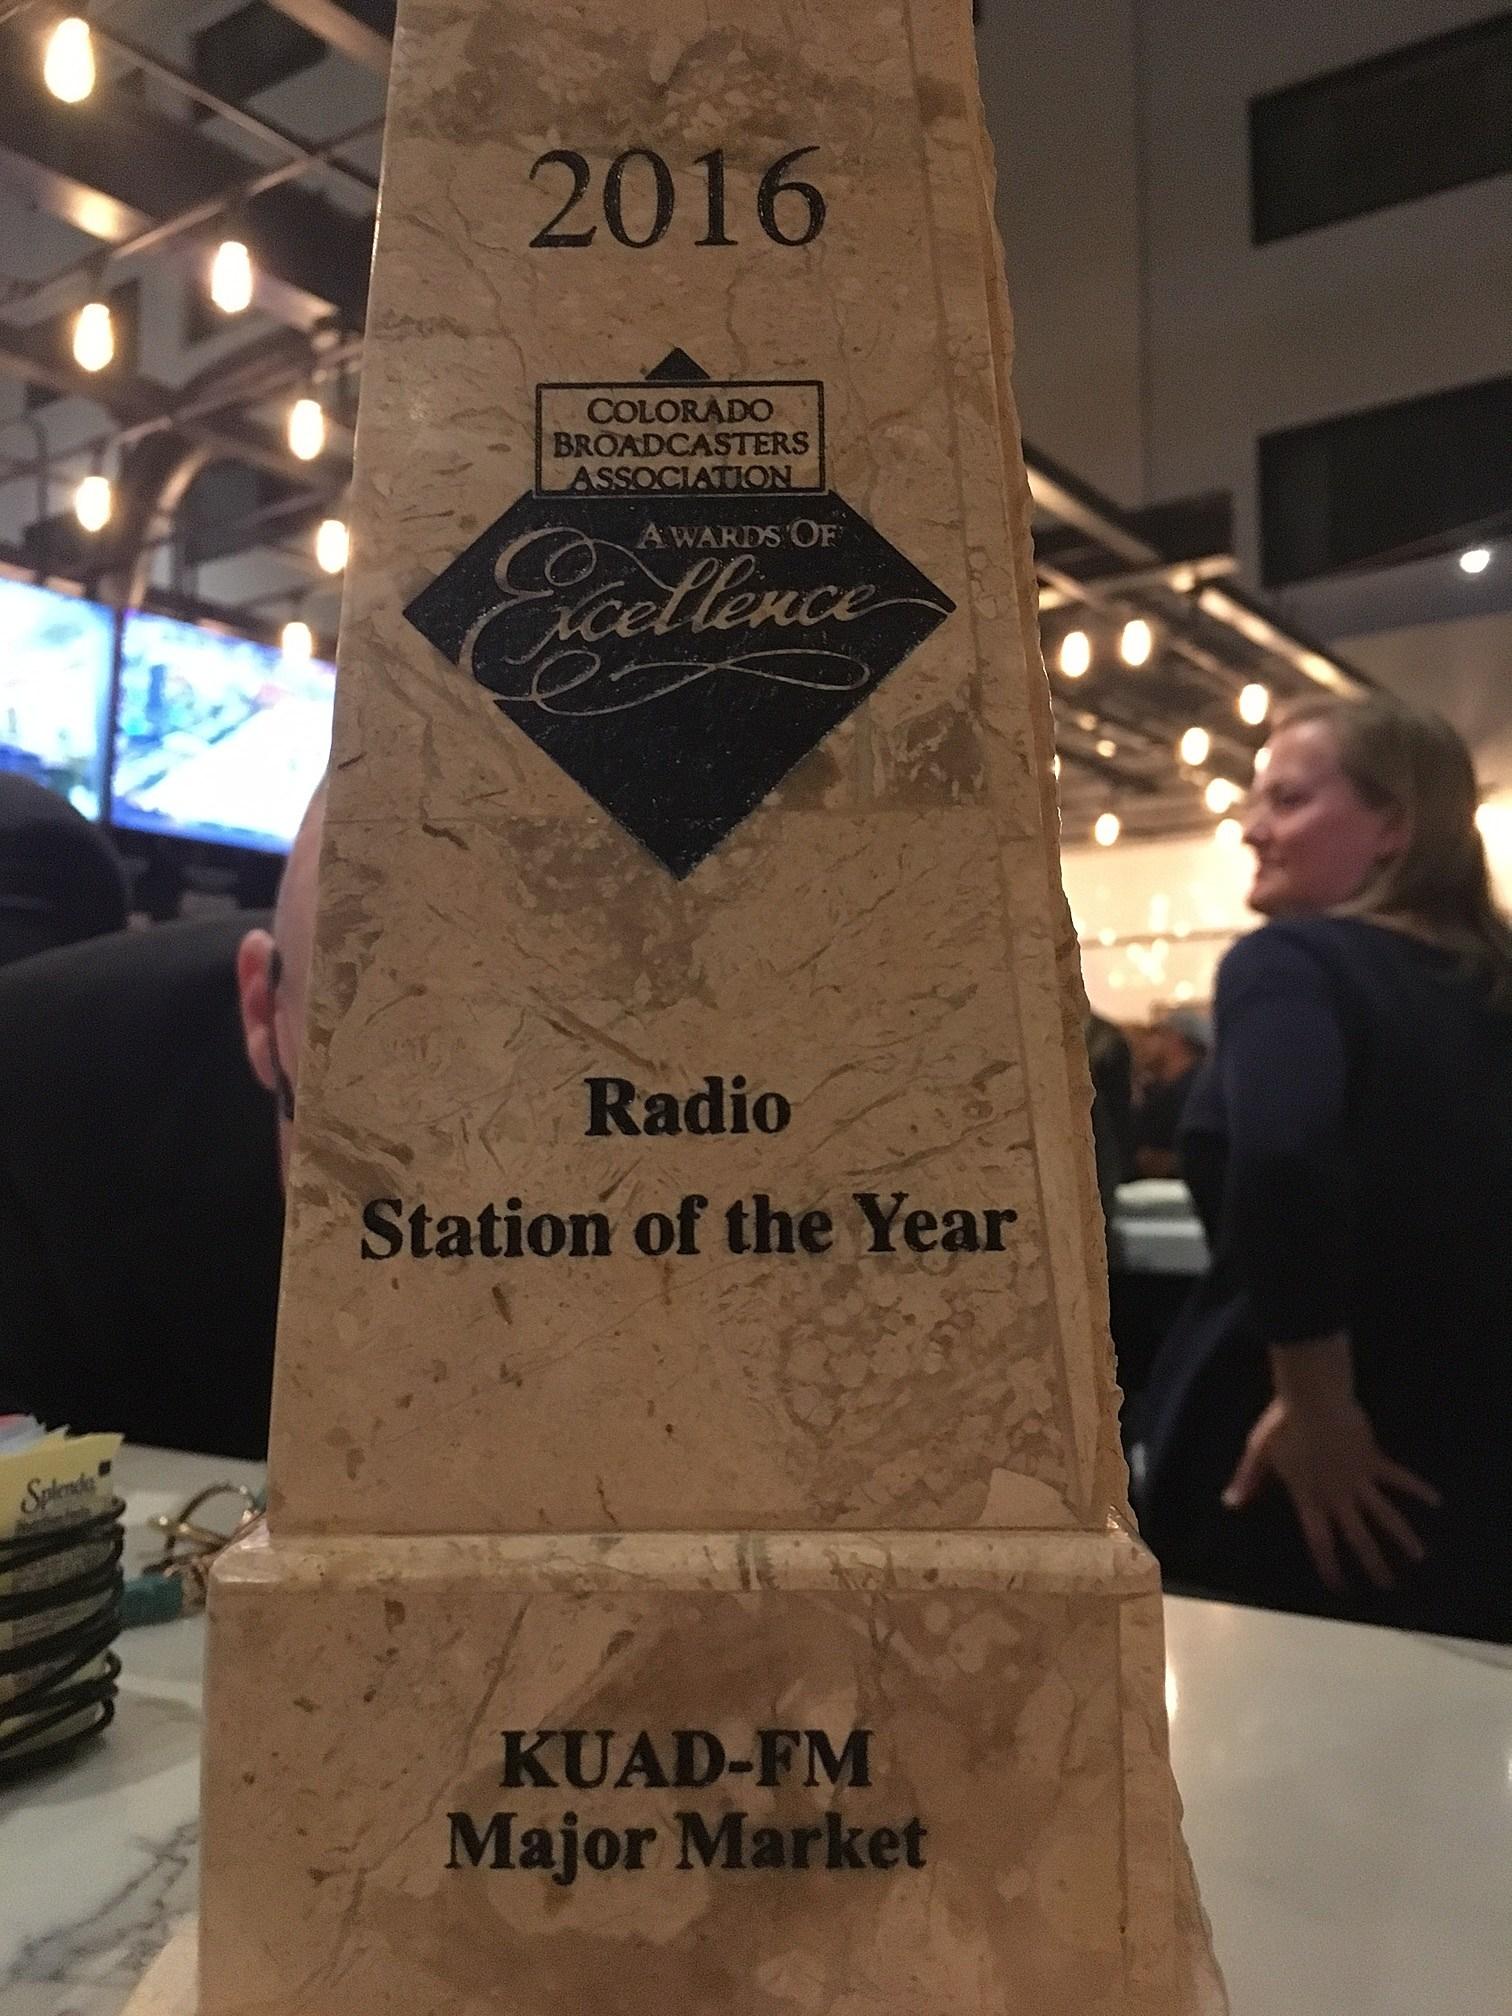 K99 Won Station of the Year at the 2017 CBA Awards